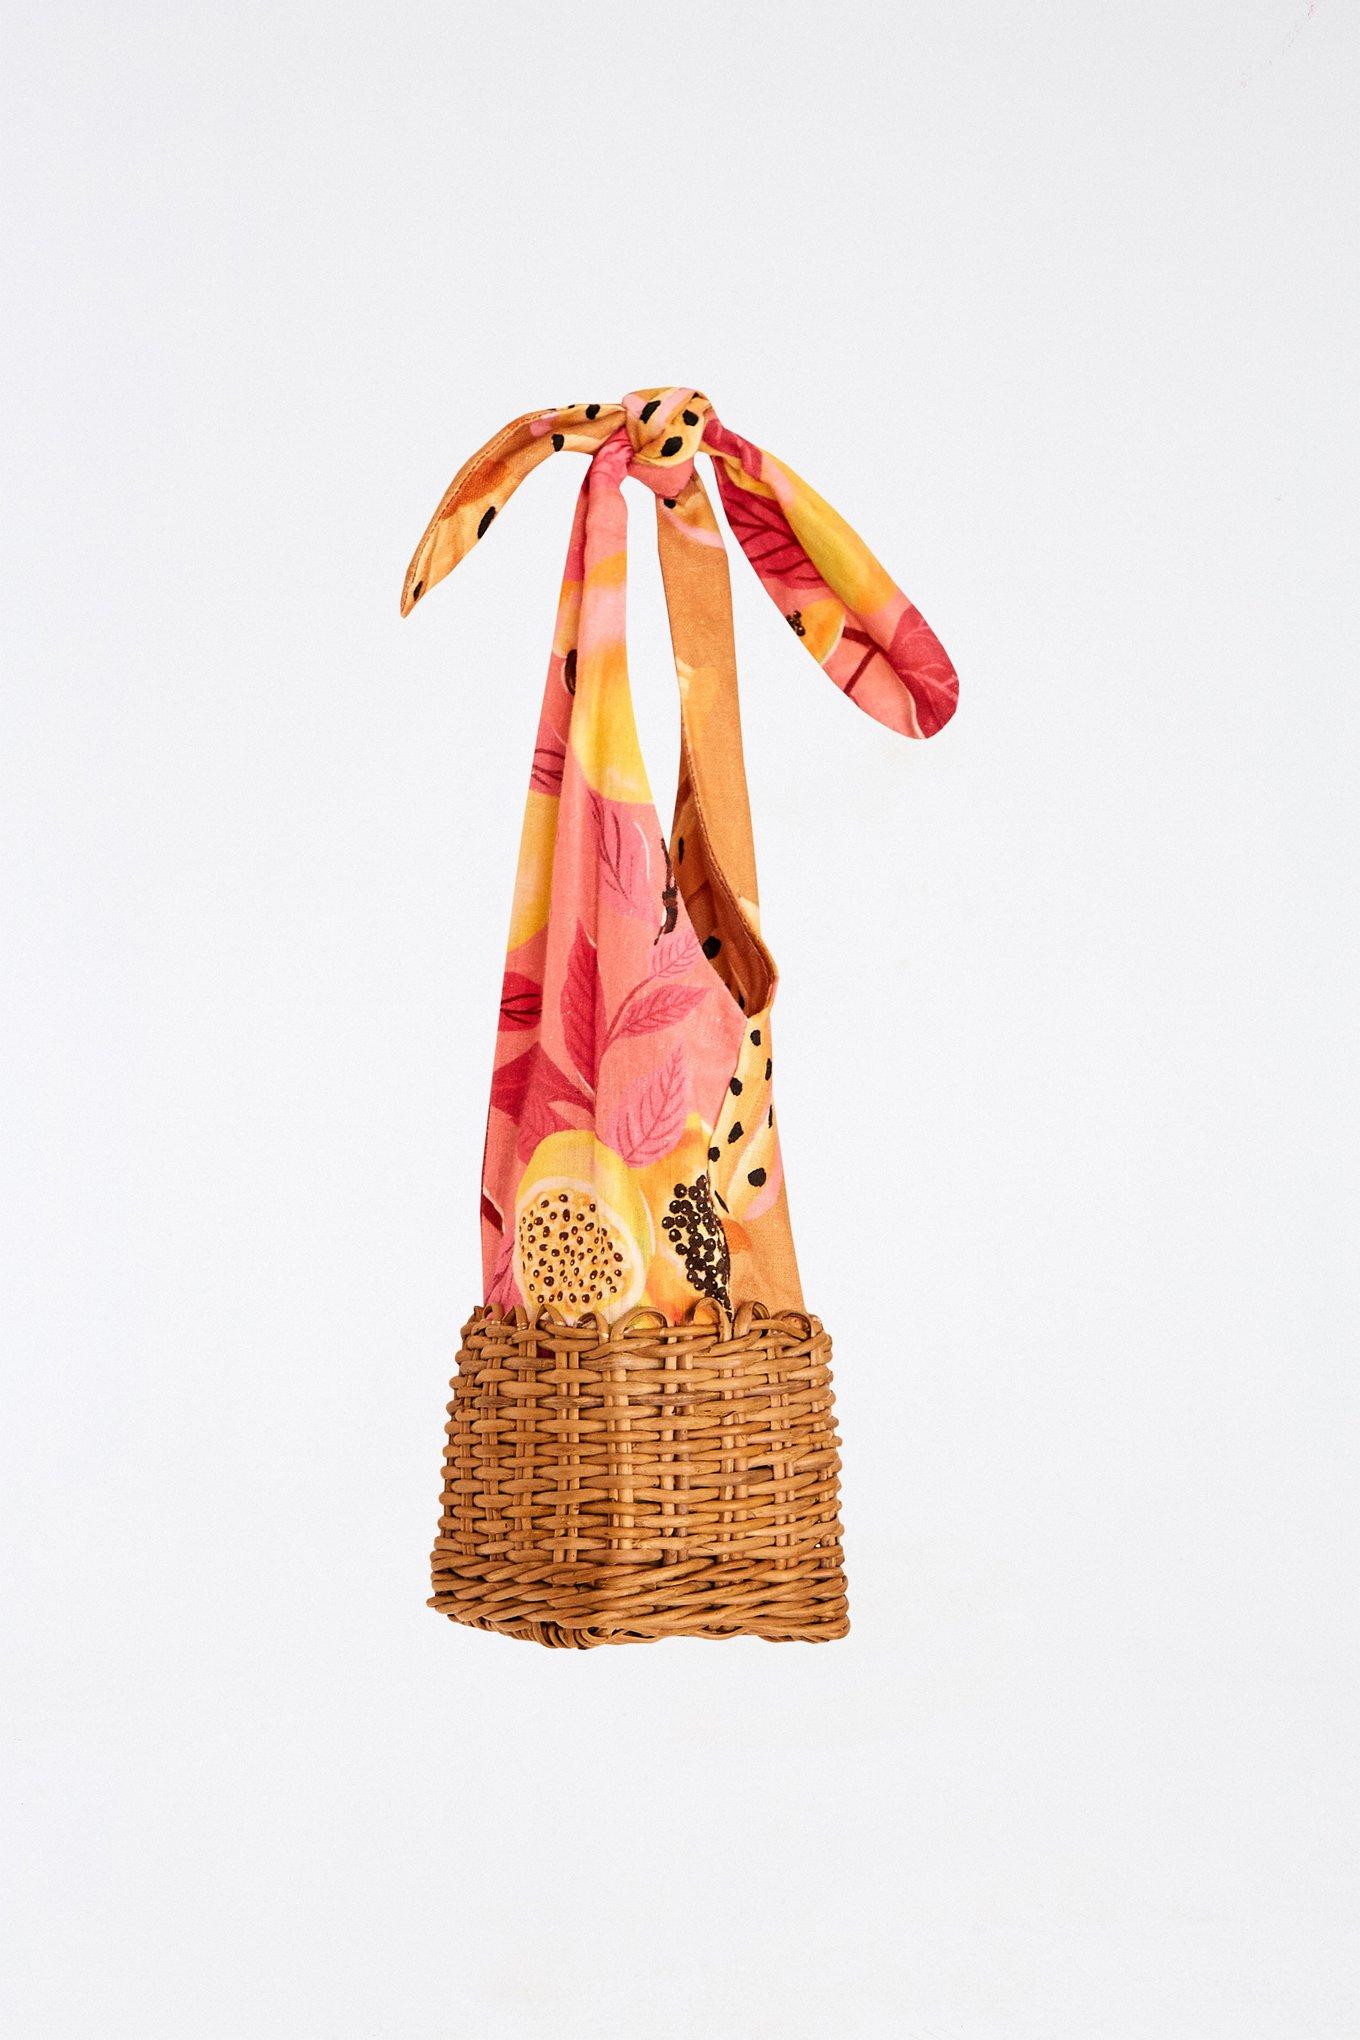 Mixed Prints Straw Mini Bagag $110